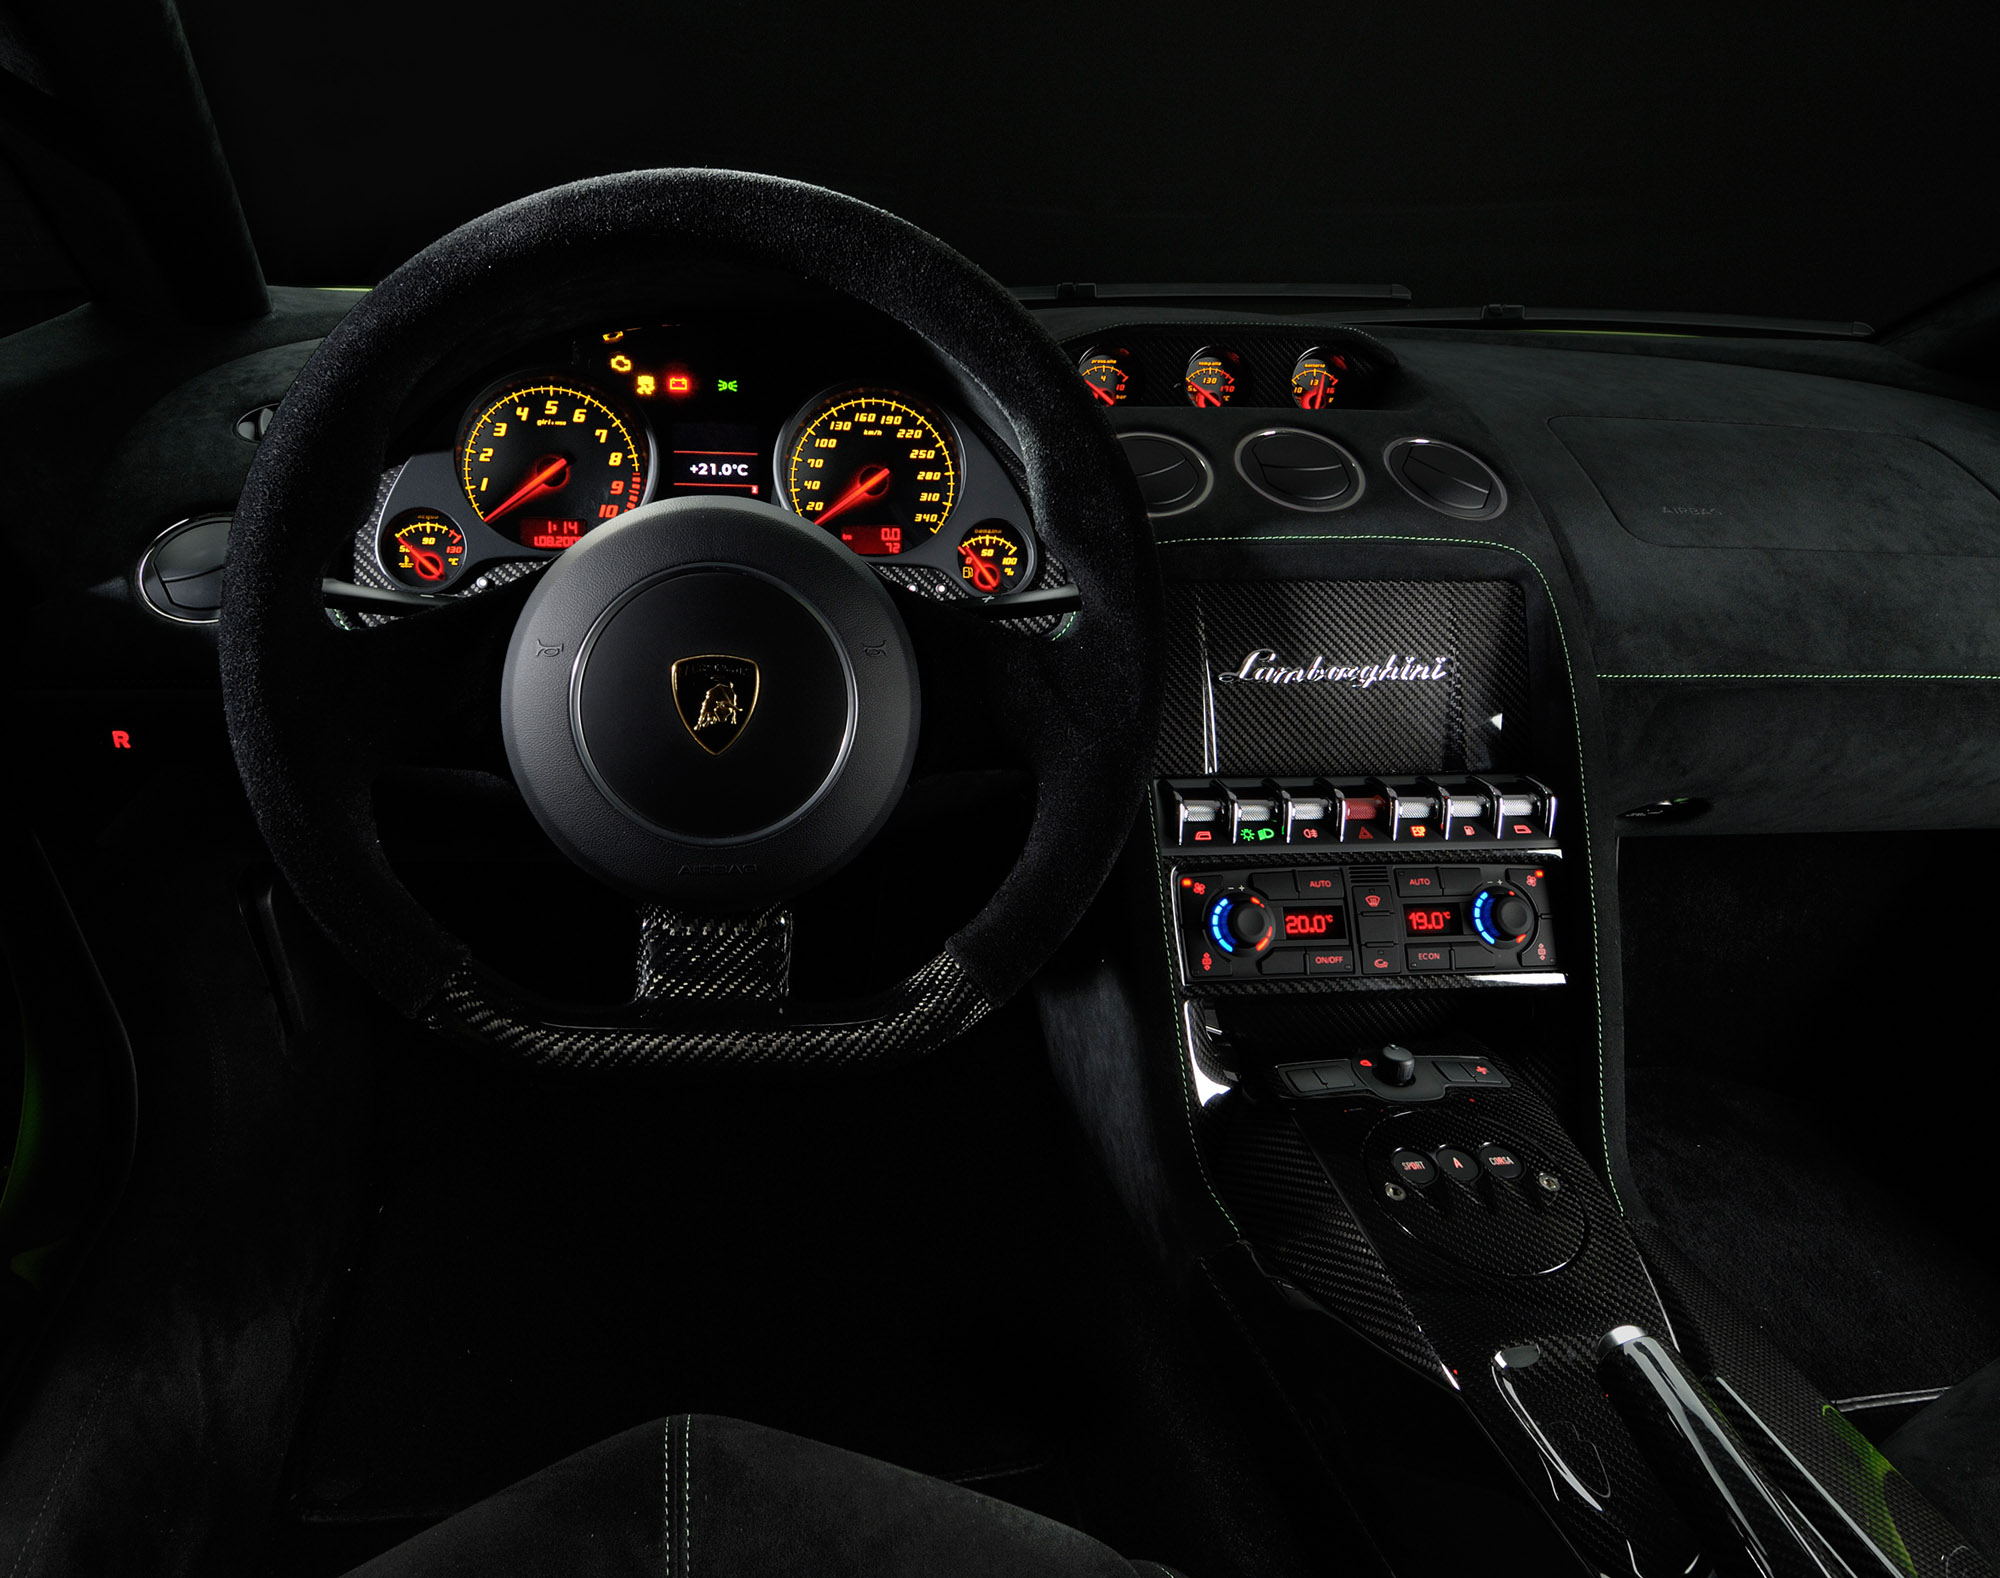 Lamborghini Gallardo LP 570-4 Superleggera - фотография №1